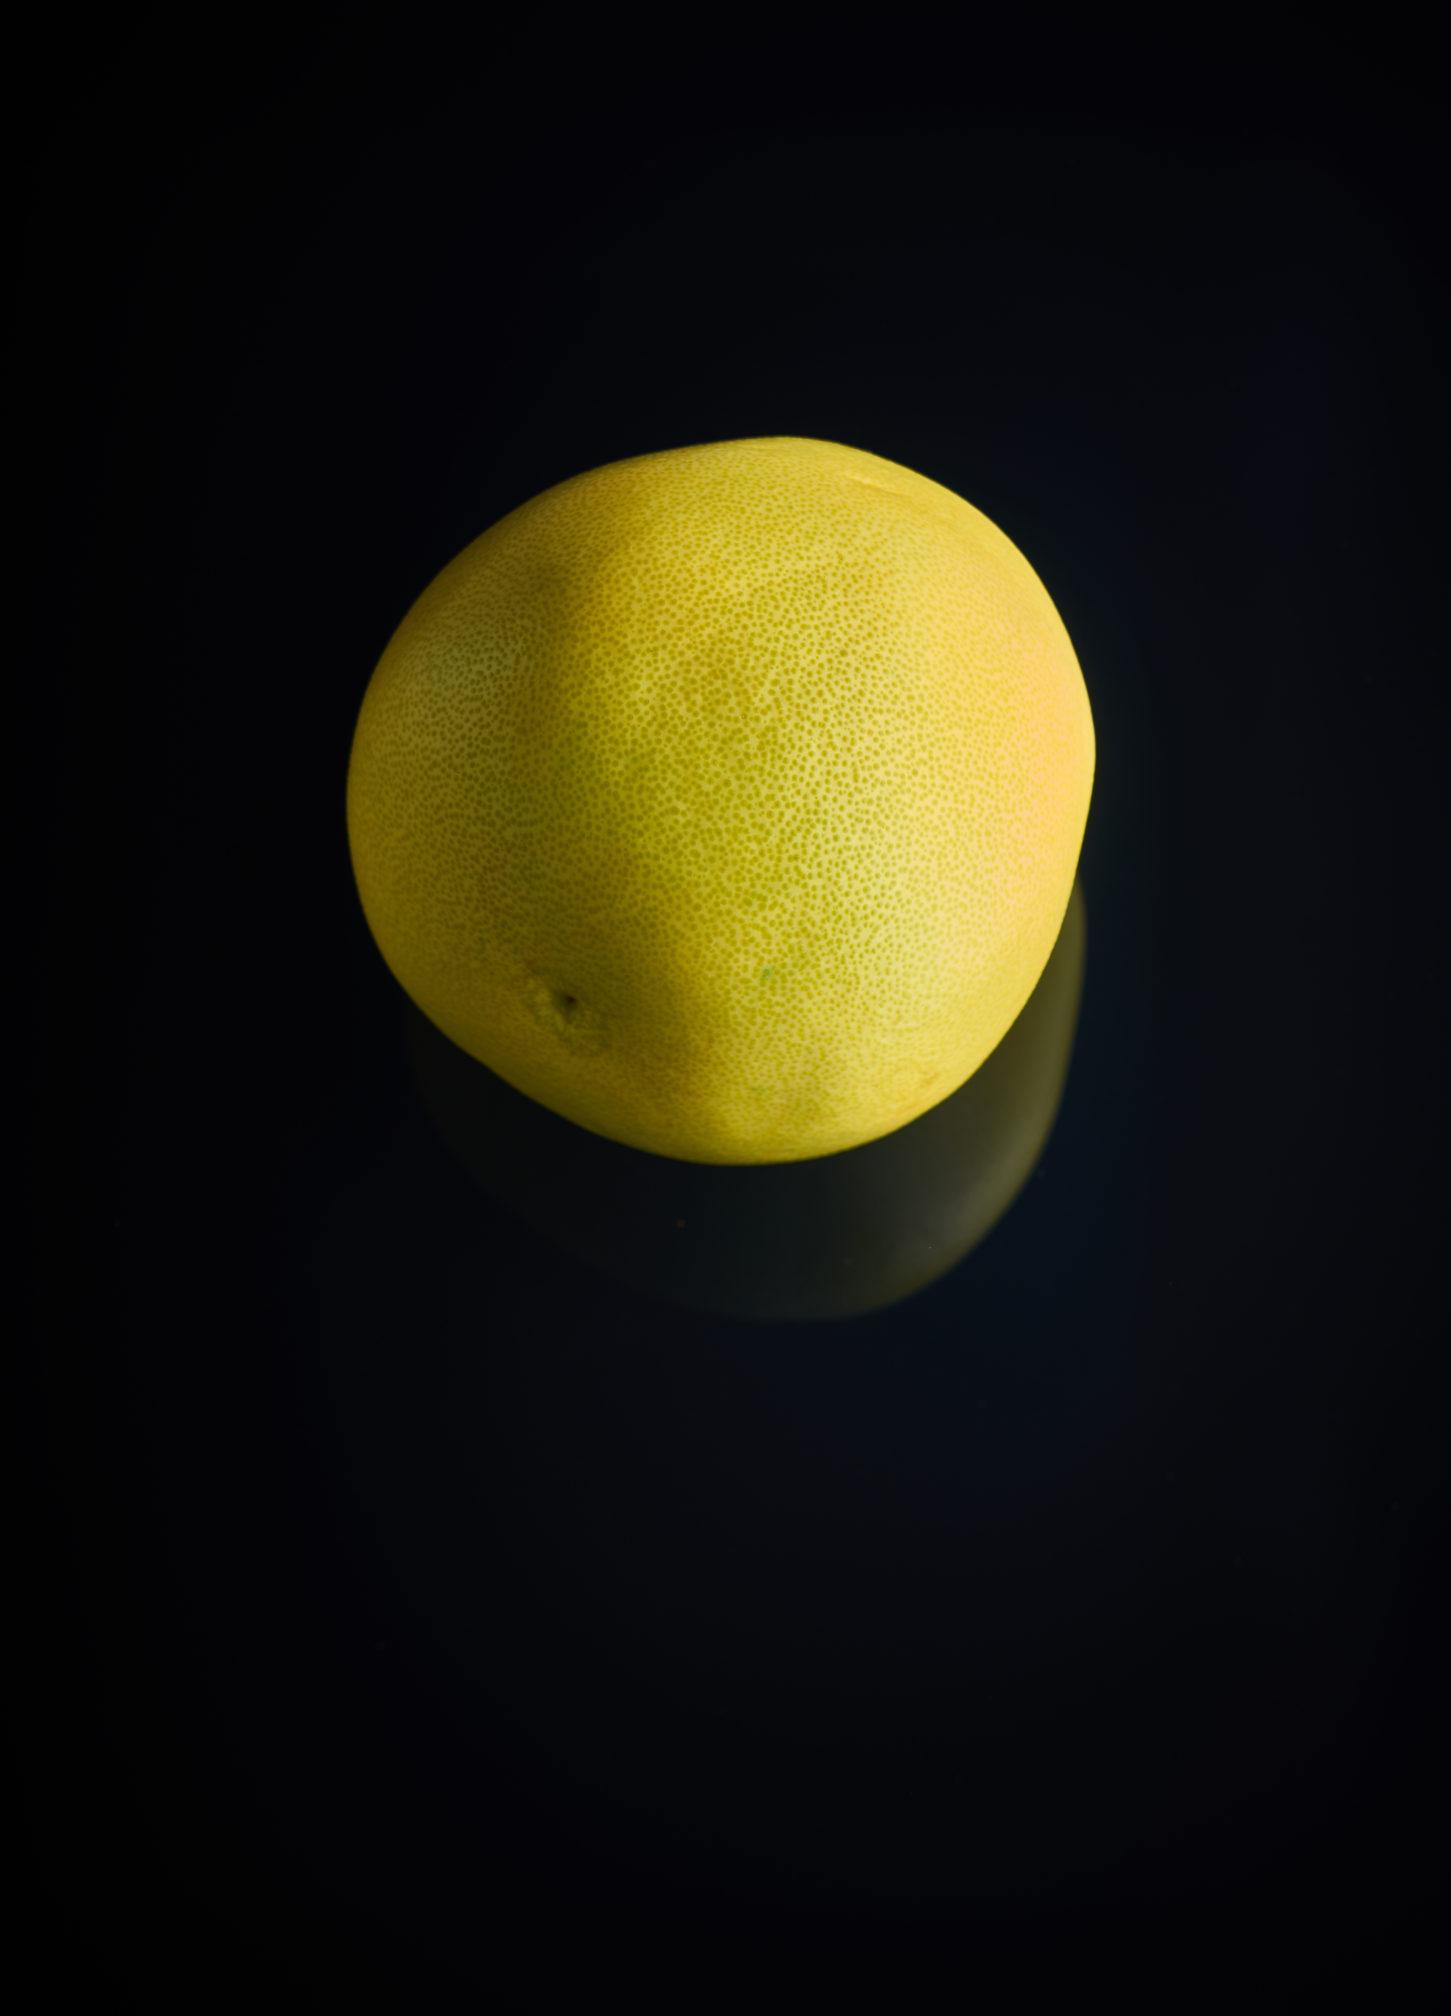 capexo-lilot-fruits-exotique-pomelo-chine-israel